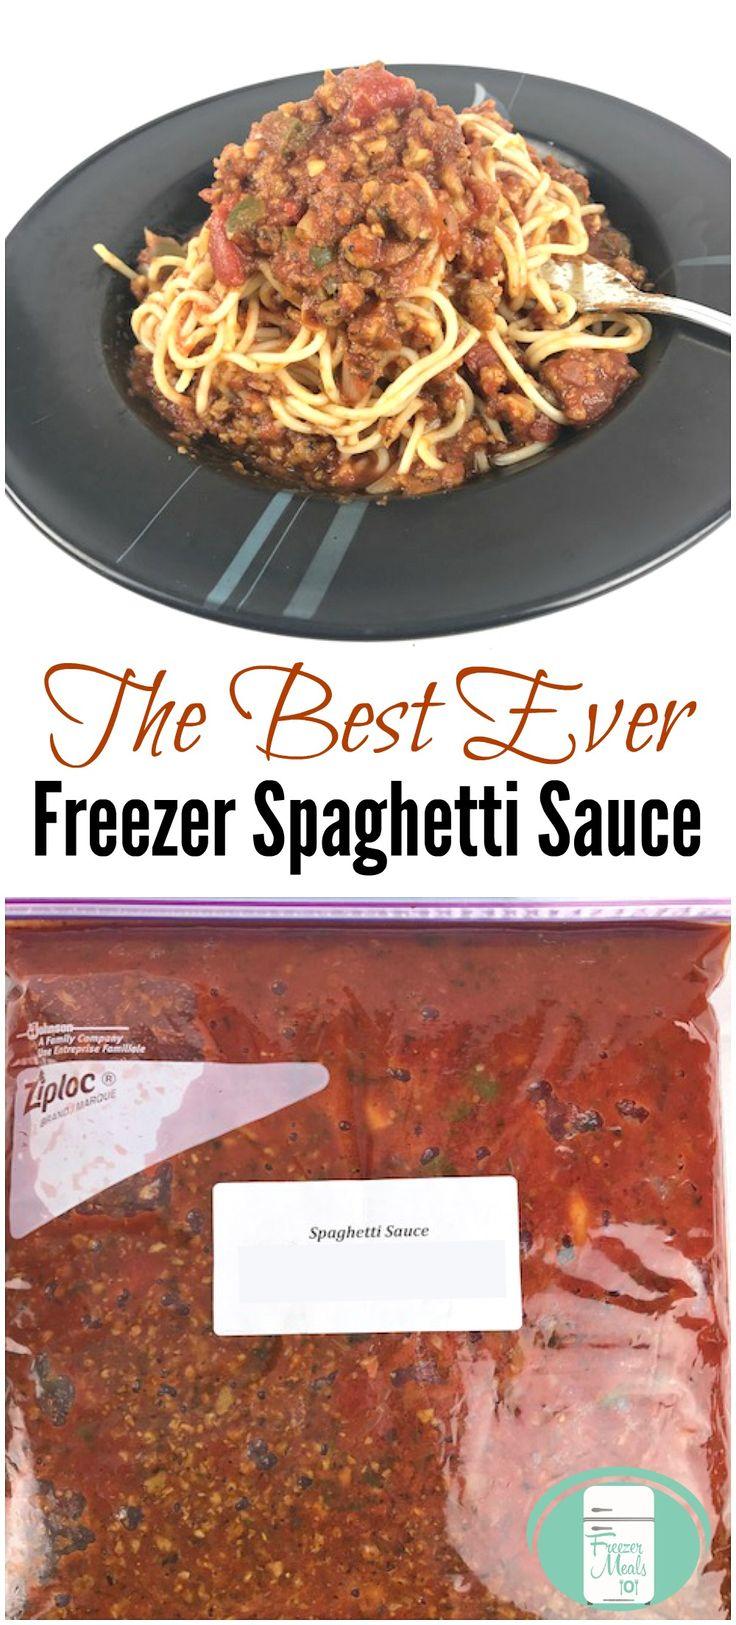 The Best Ever Freezer Spaghetti Sauce Recipe